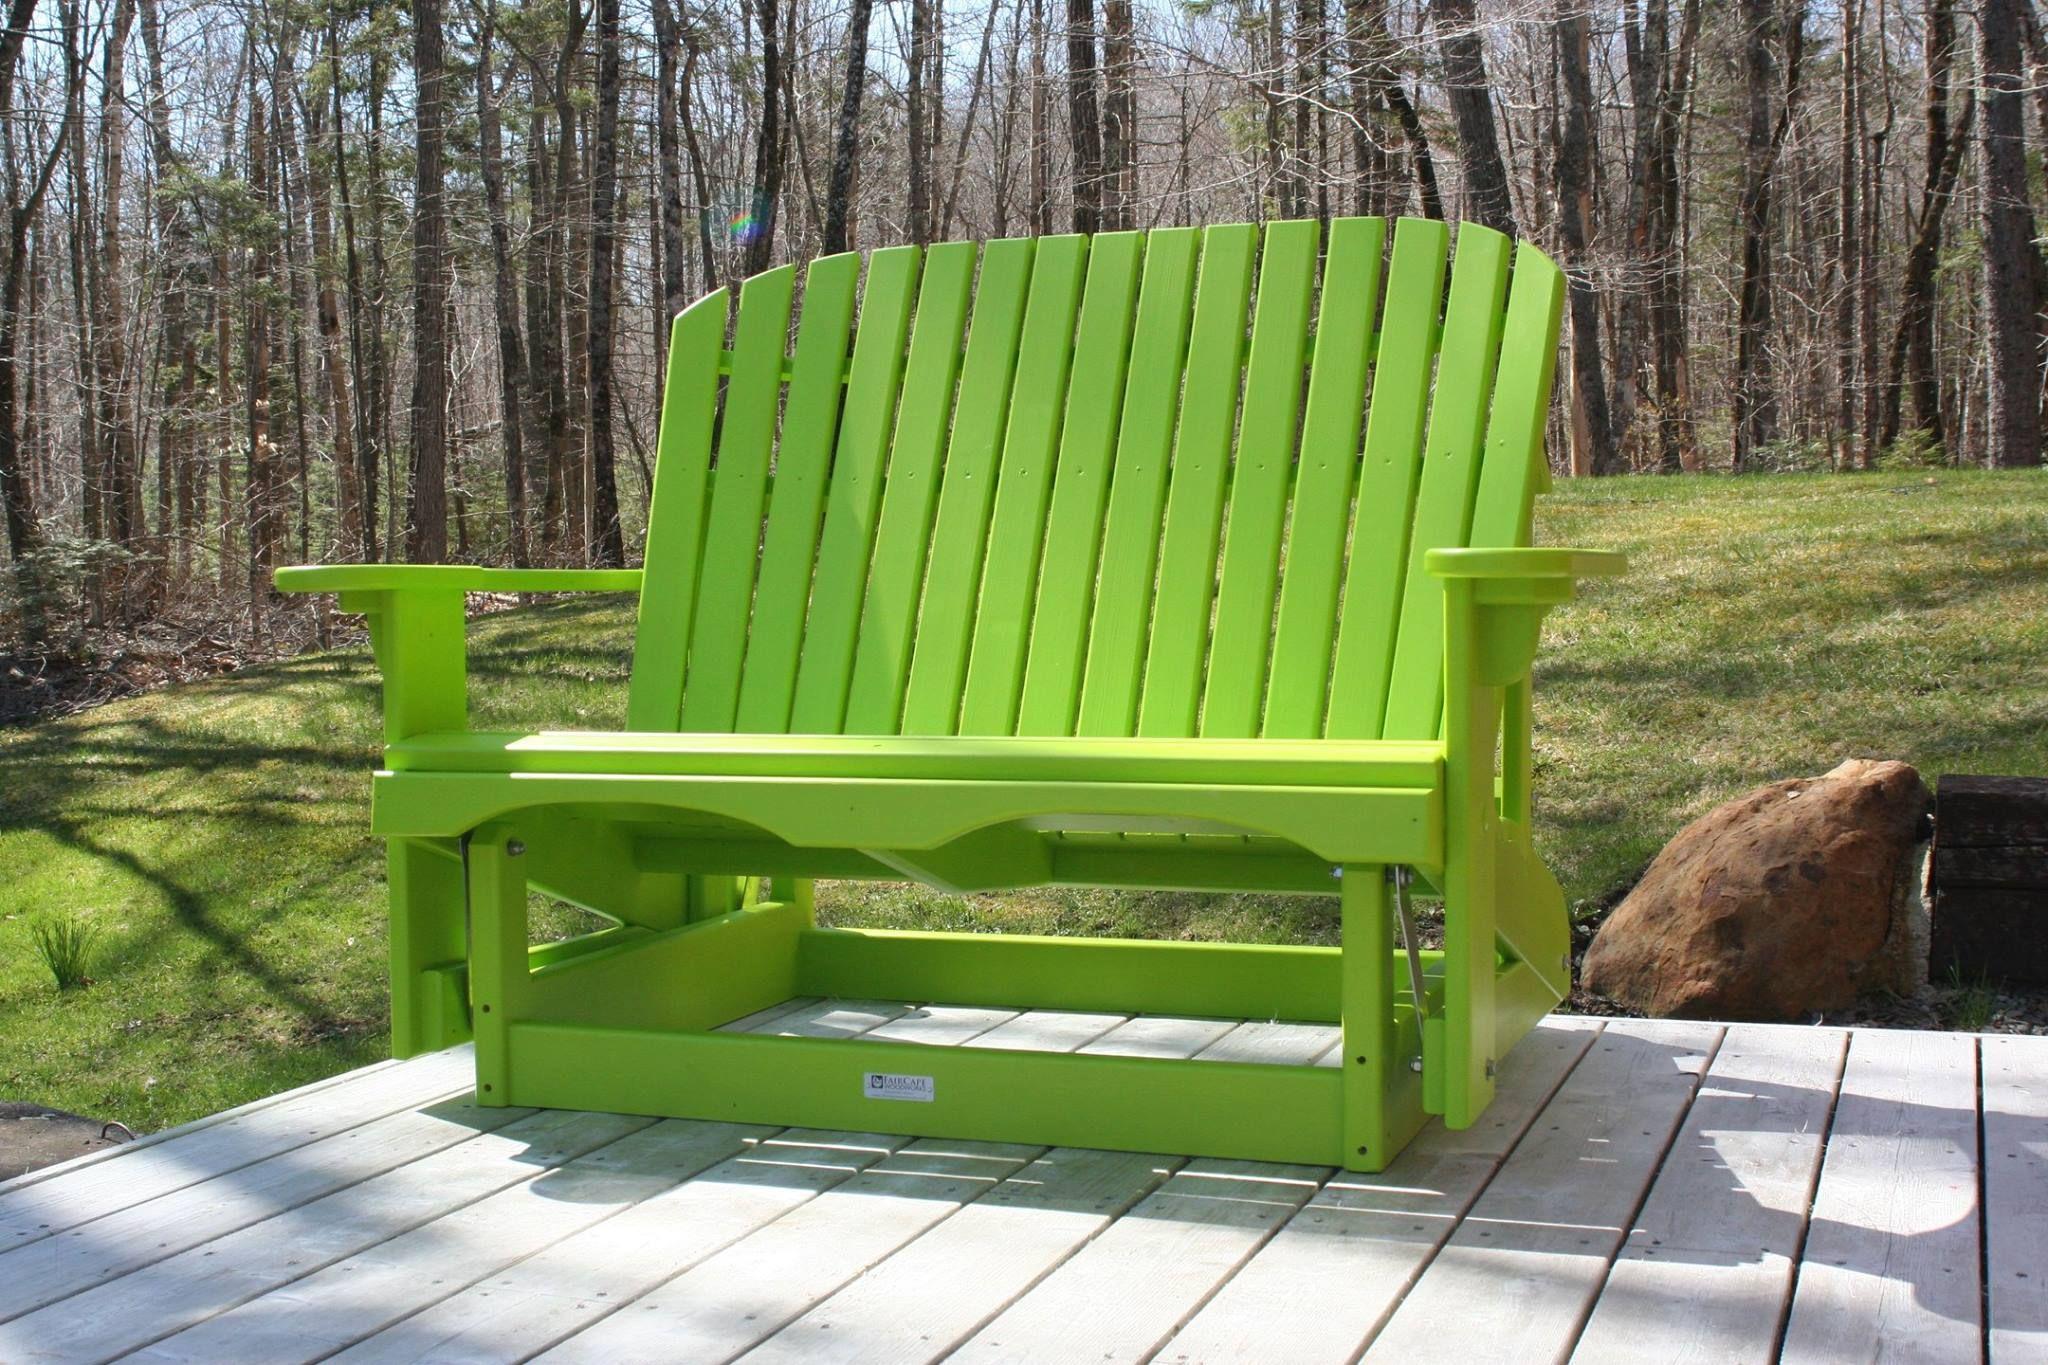 Margarita love seat glider Adirondack furniture